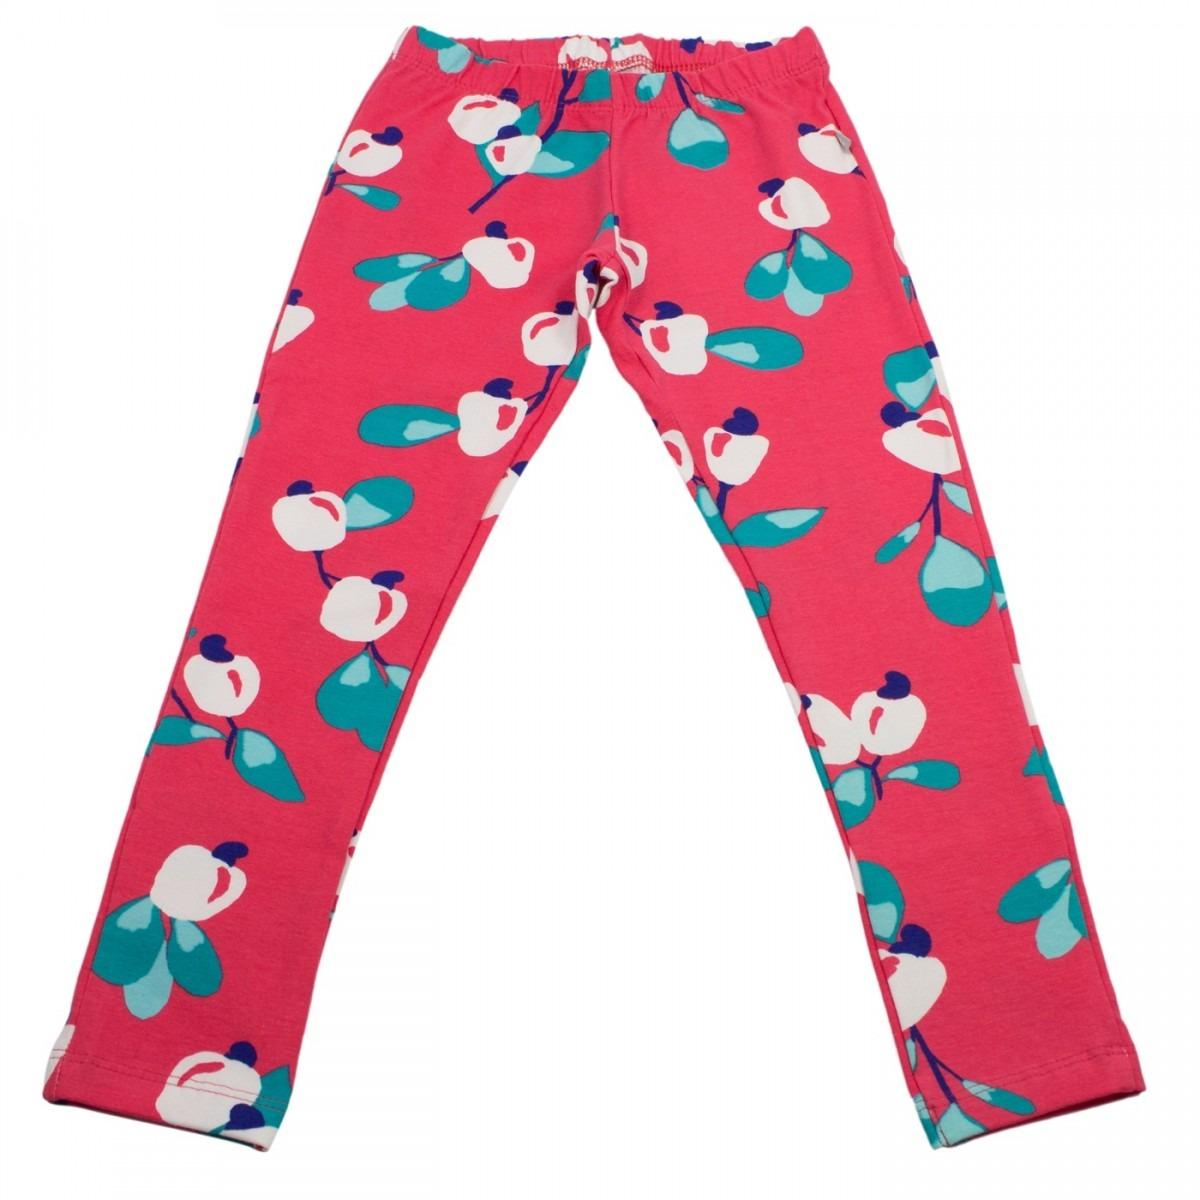 6f48b15d1 calça legging infantil feminina hering kids floral 553d4g00. Carregando  zoom.